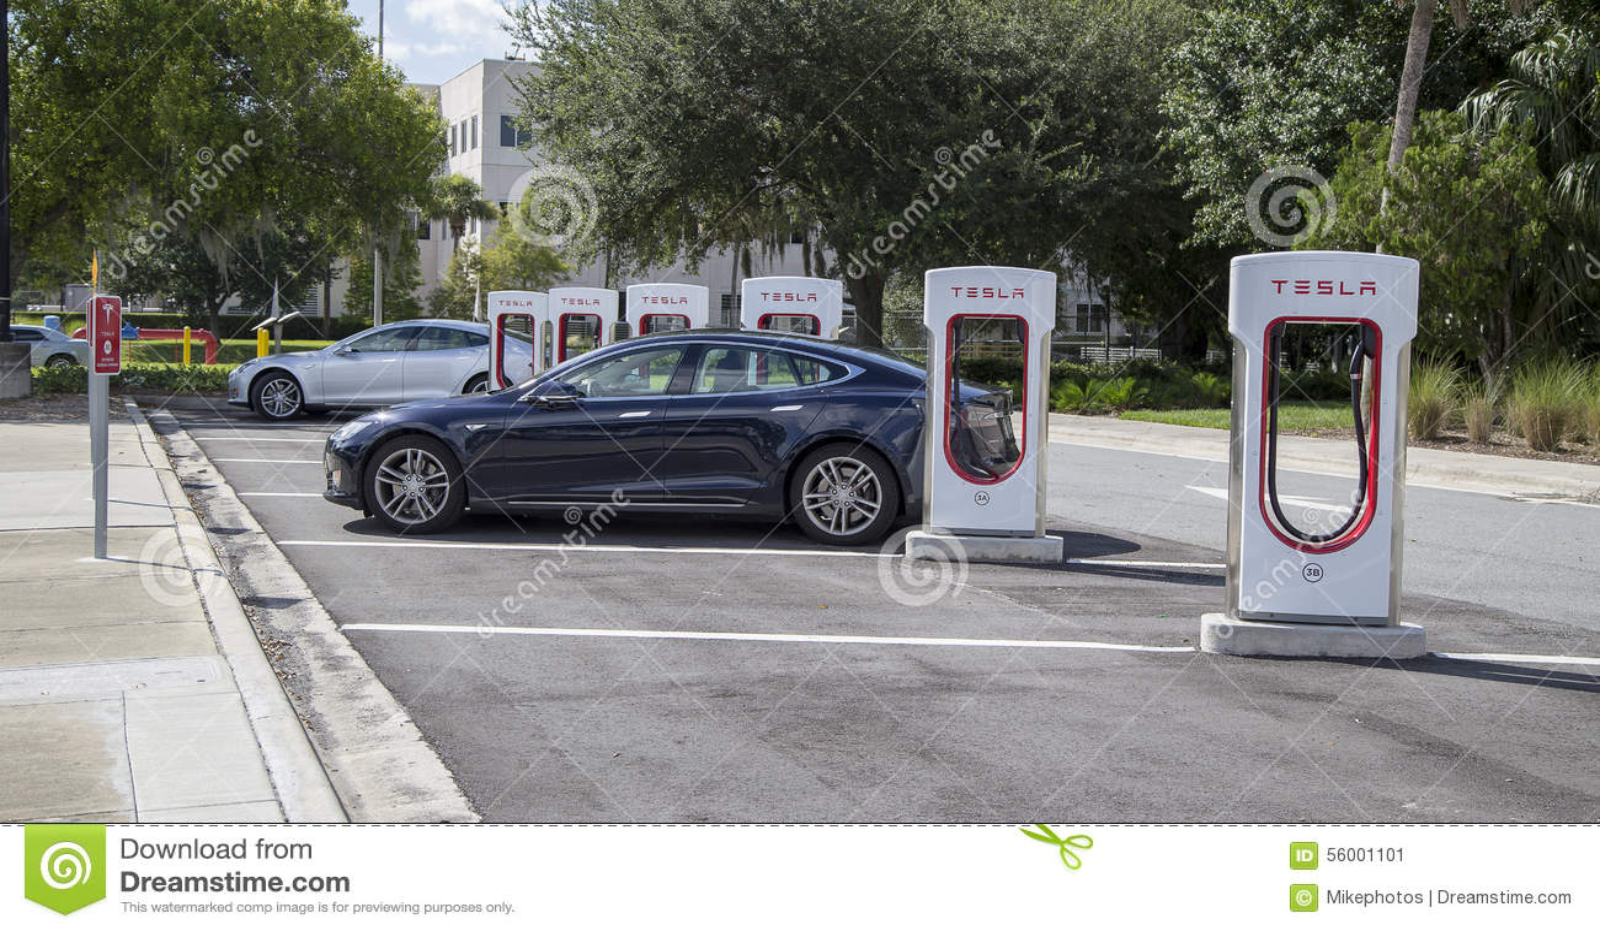 cars at tesla charging stations stock photo image 56001101. Black Bedroom Furniture Sets. Home Design Ideas